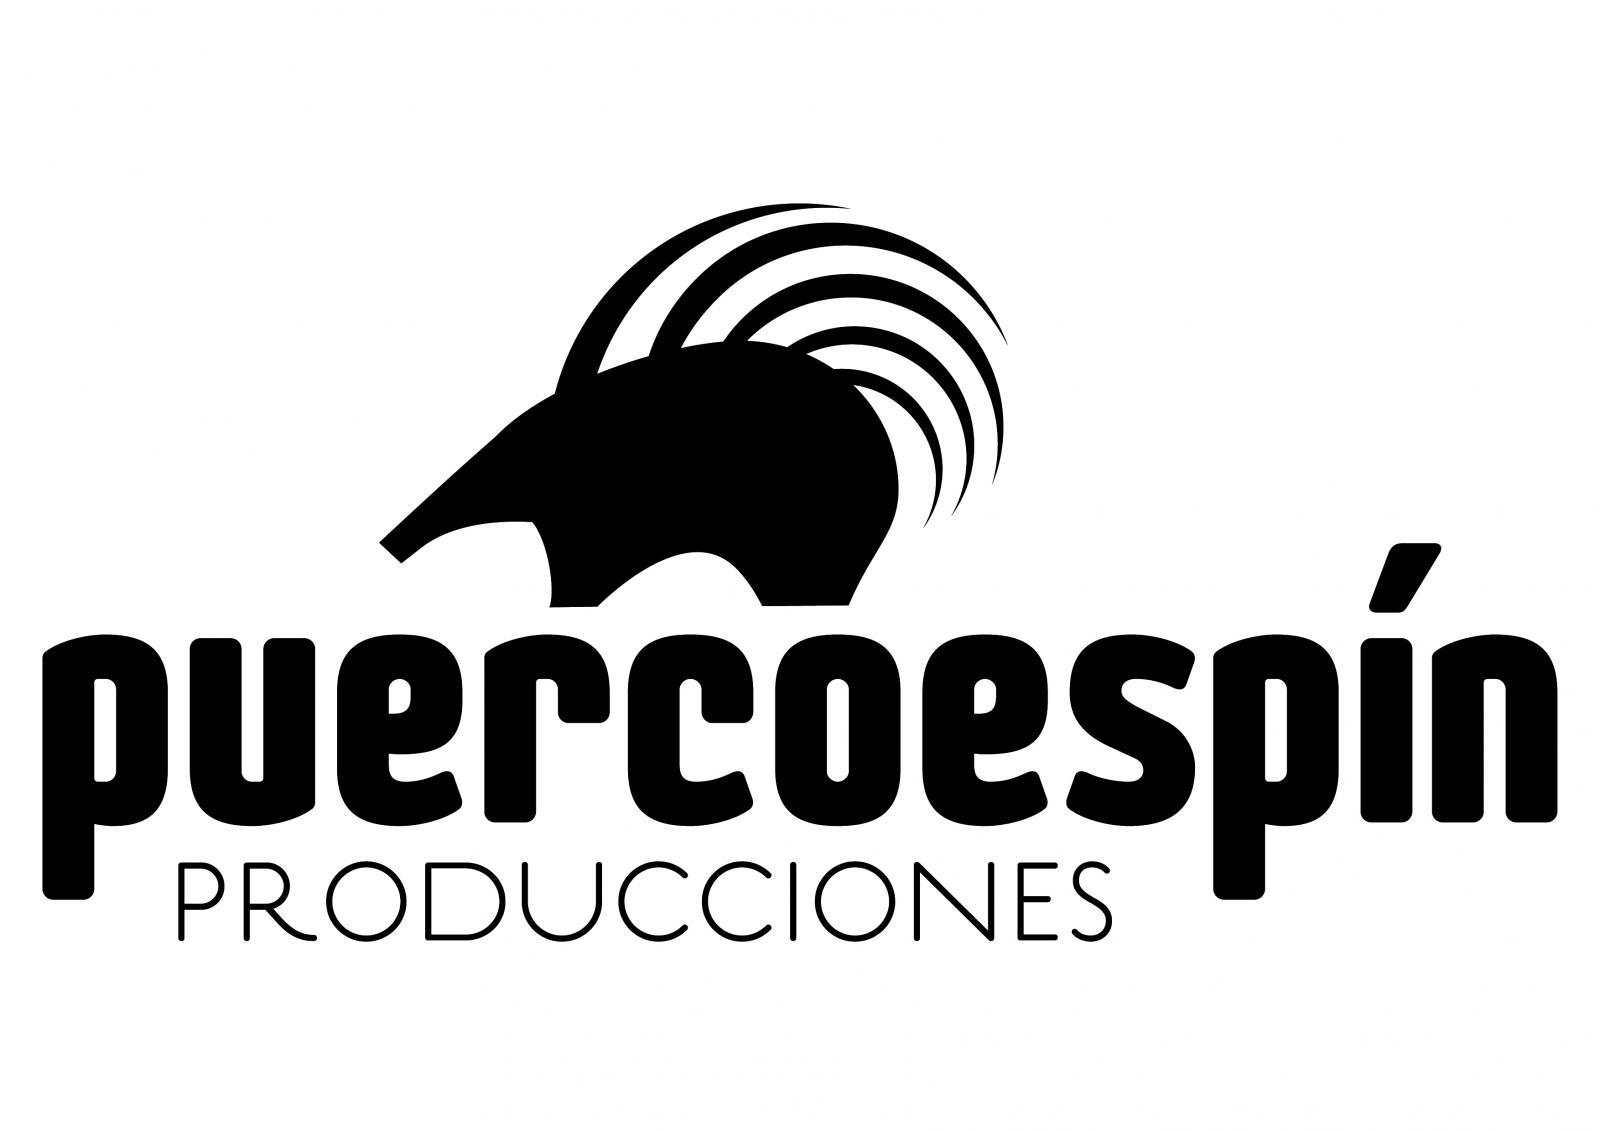 logo puercoespin_0